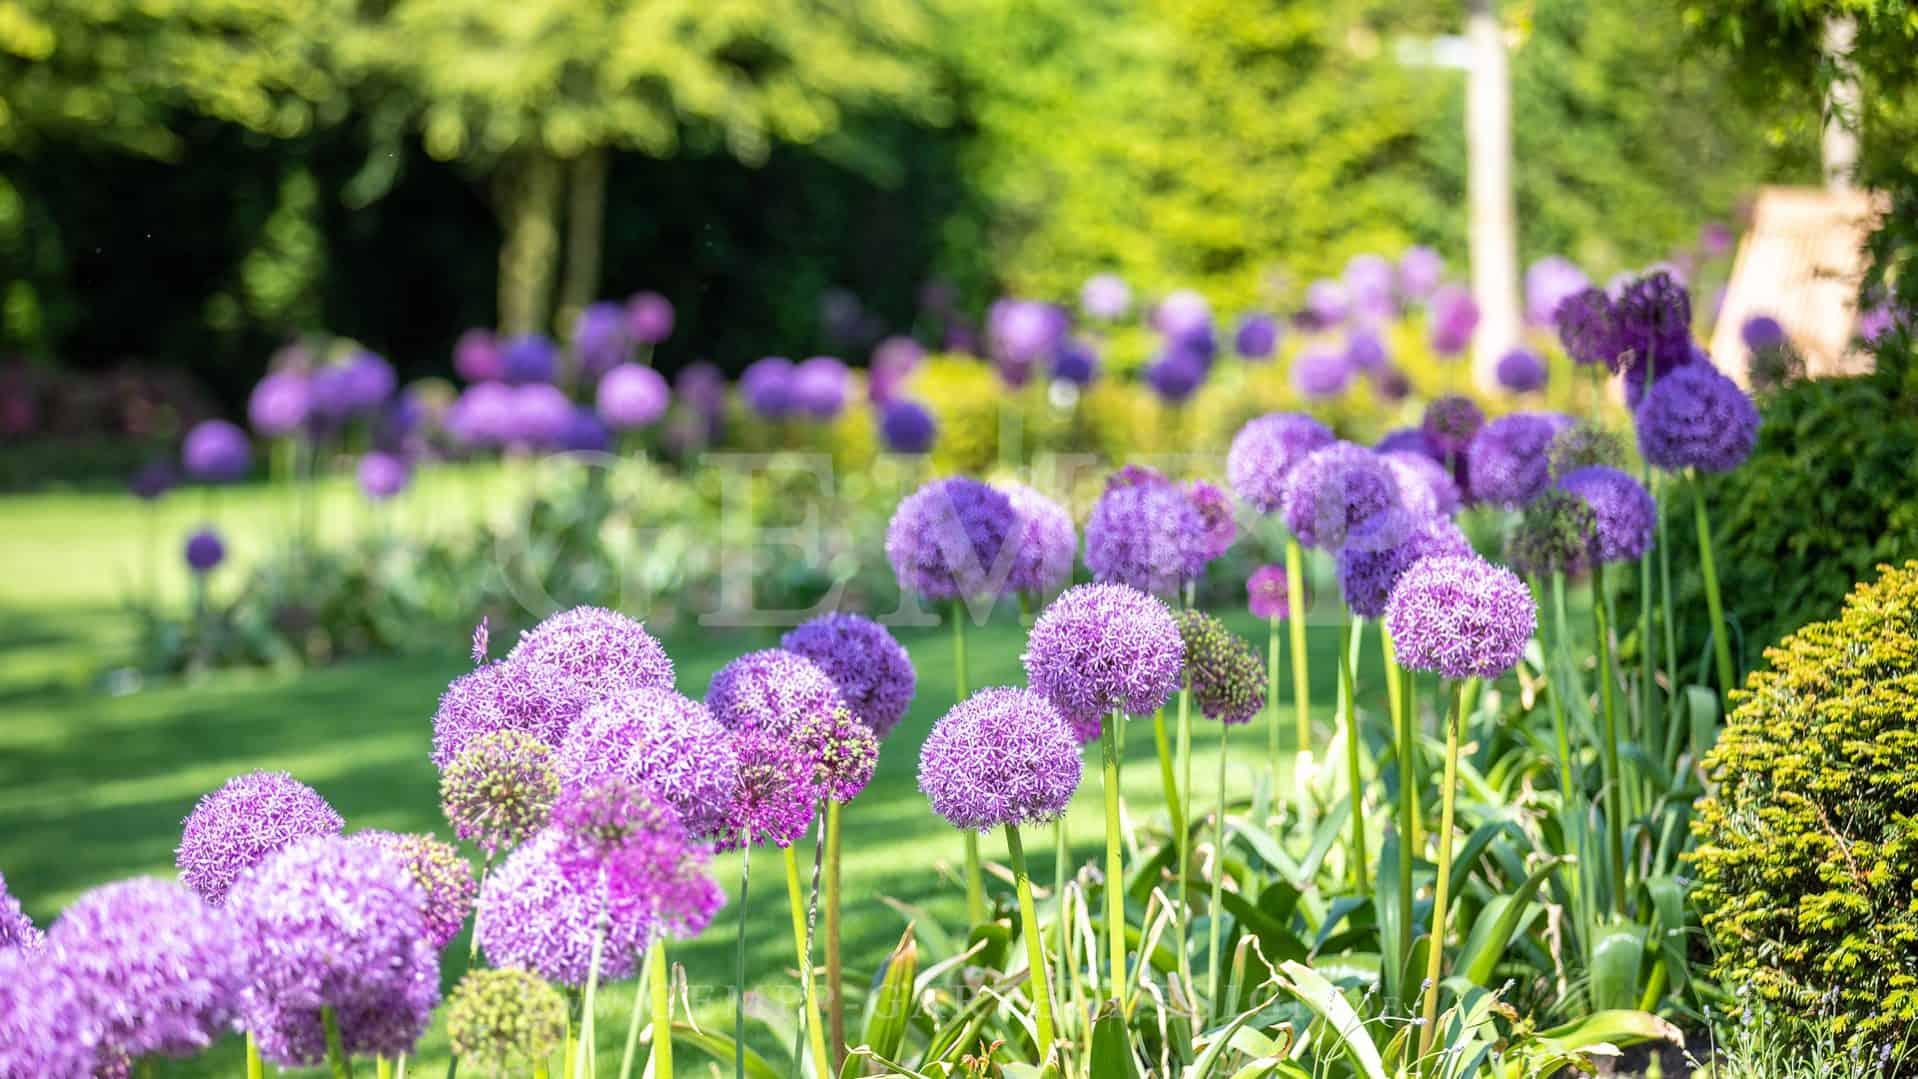 Garten neu gestalten lassen